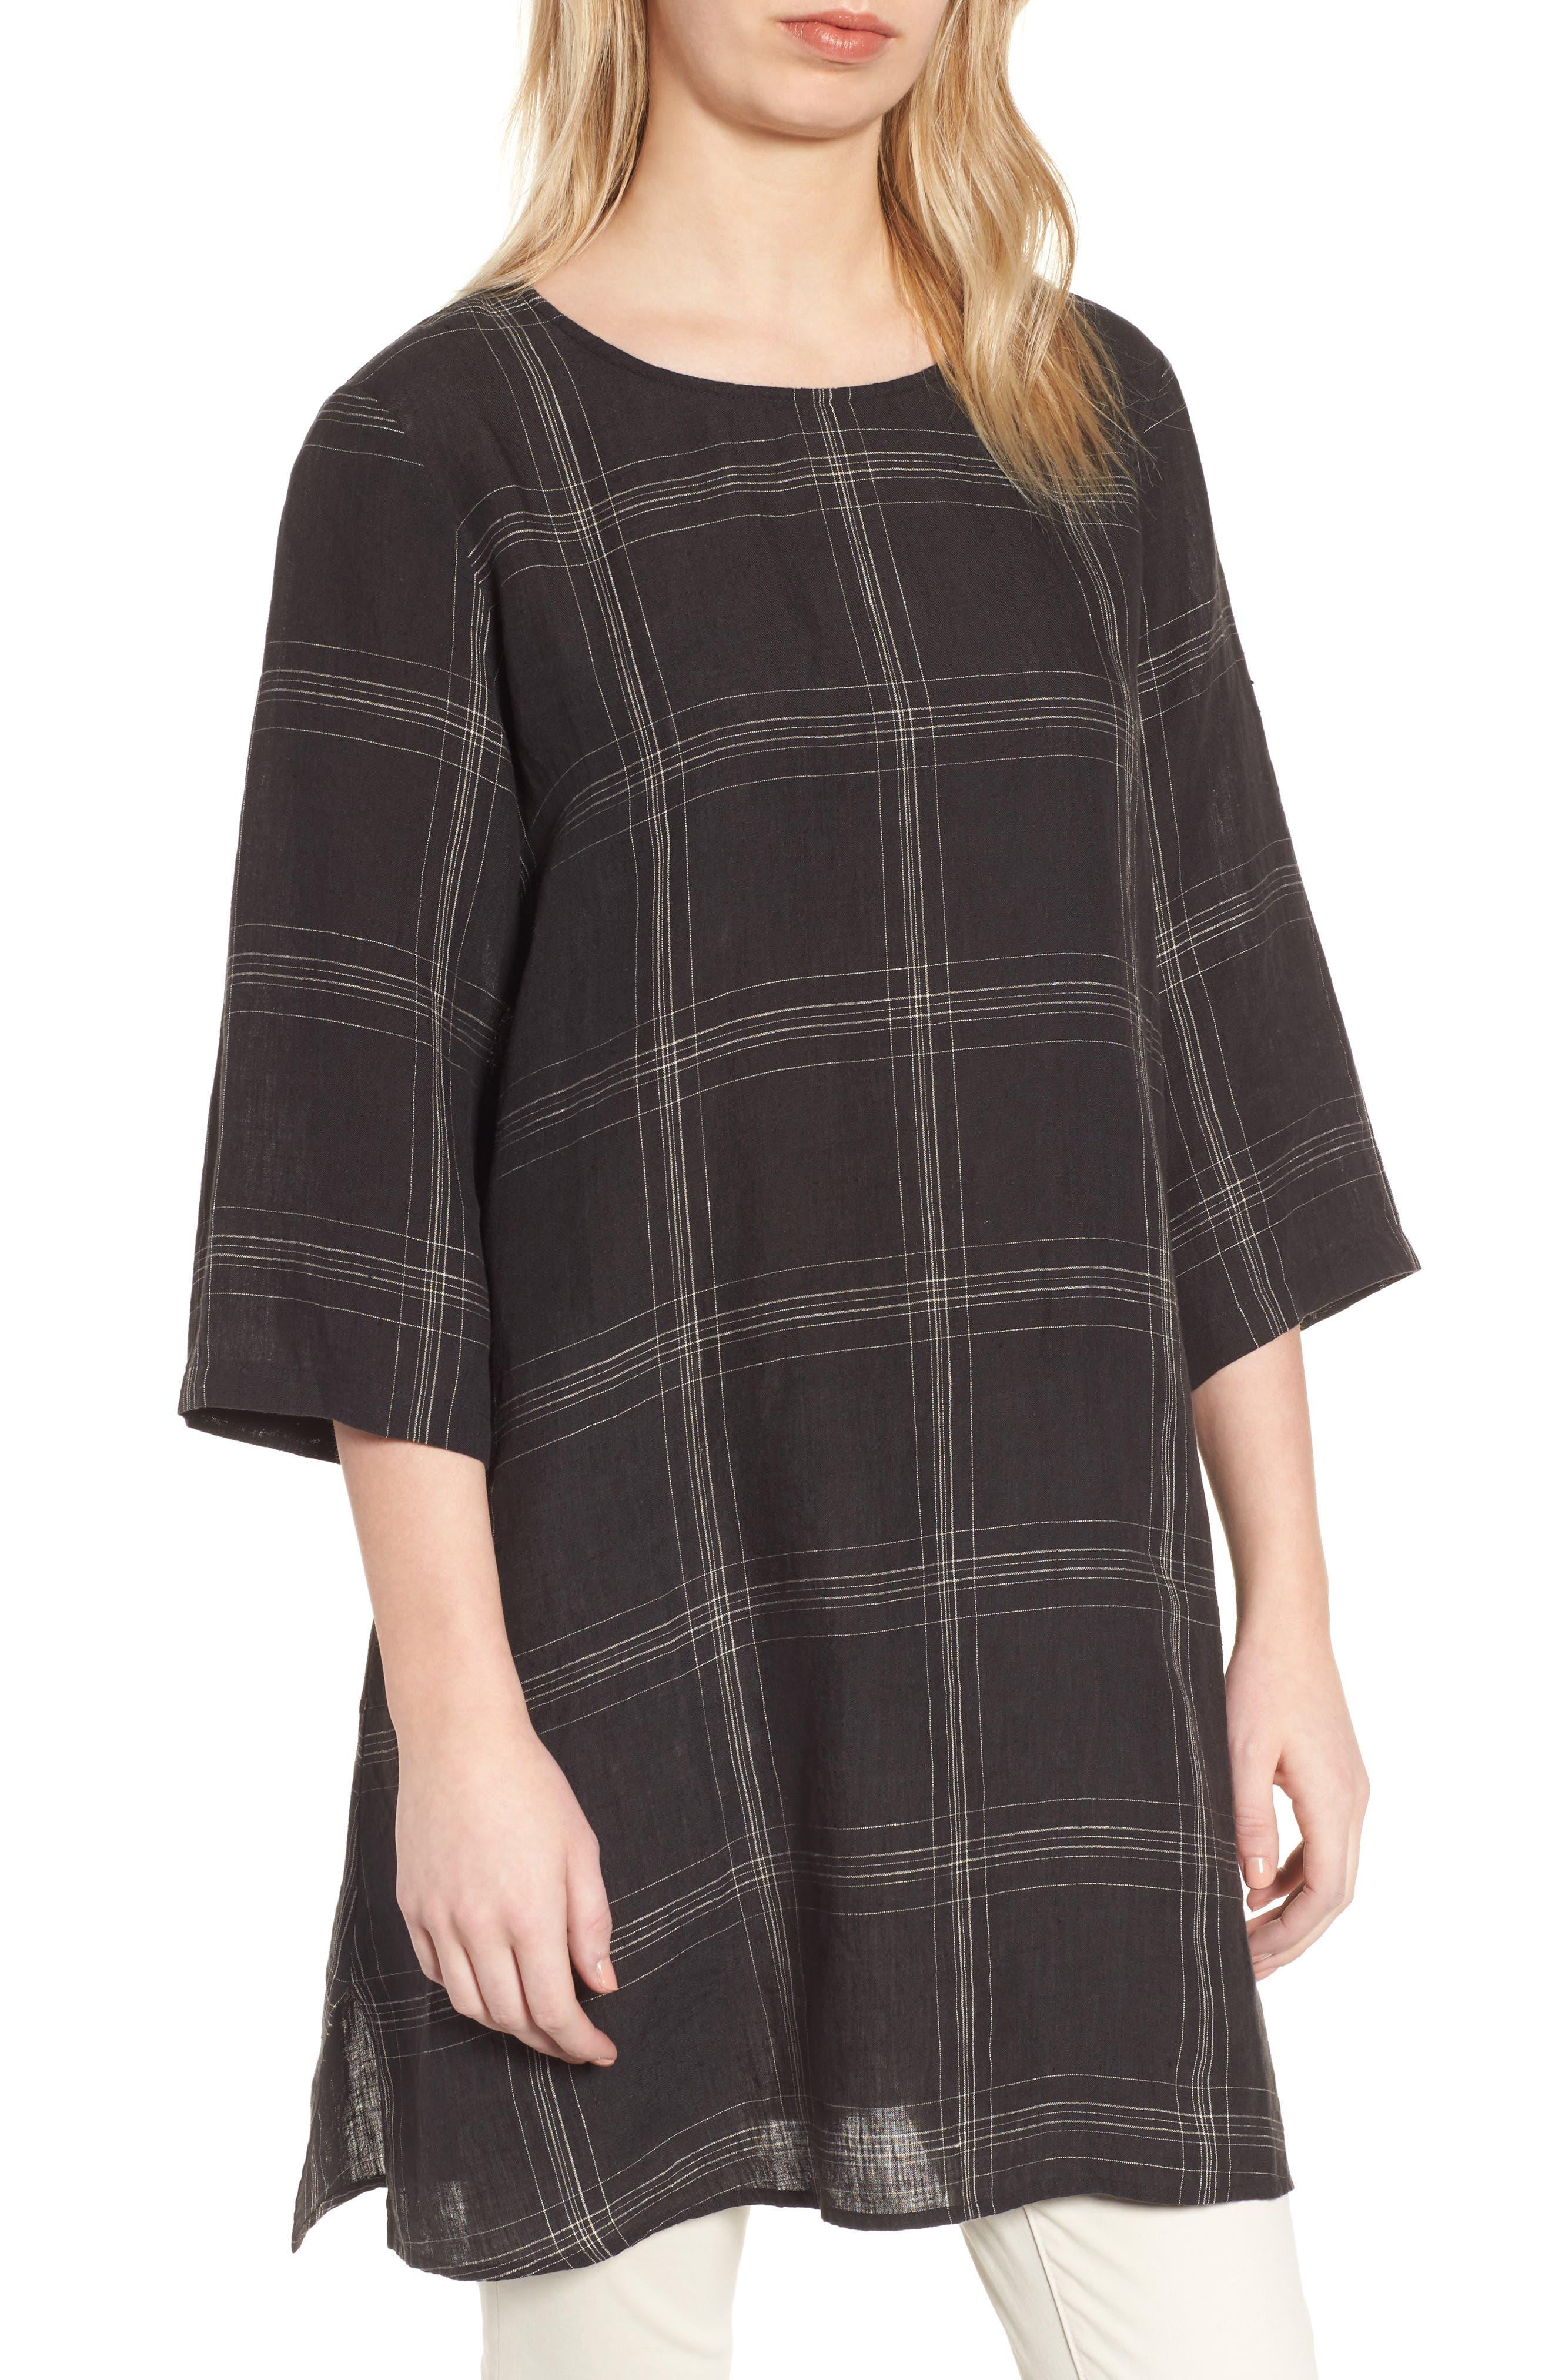 Eileen Fisher Plaid Organic Linen Tunic (Regular & Petite)